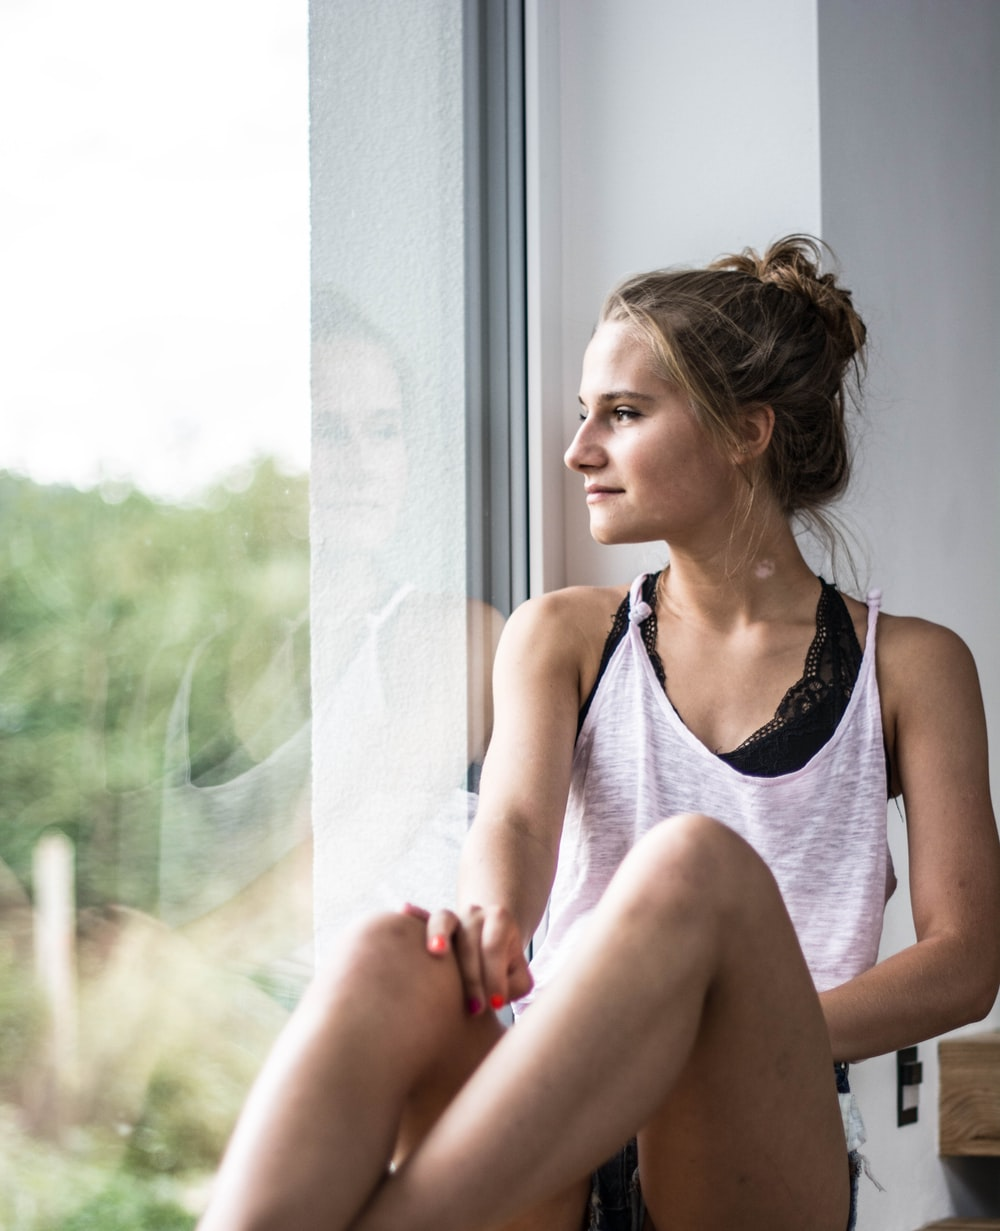 woman sitting beside window overlooking trees